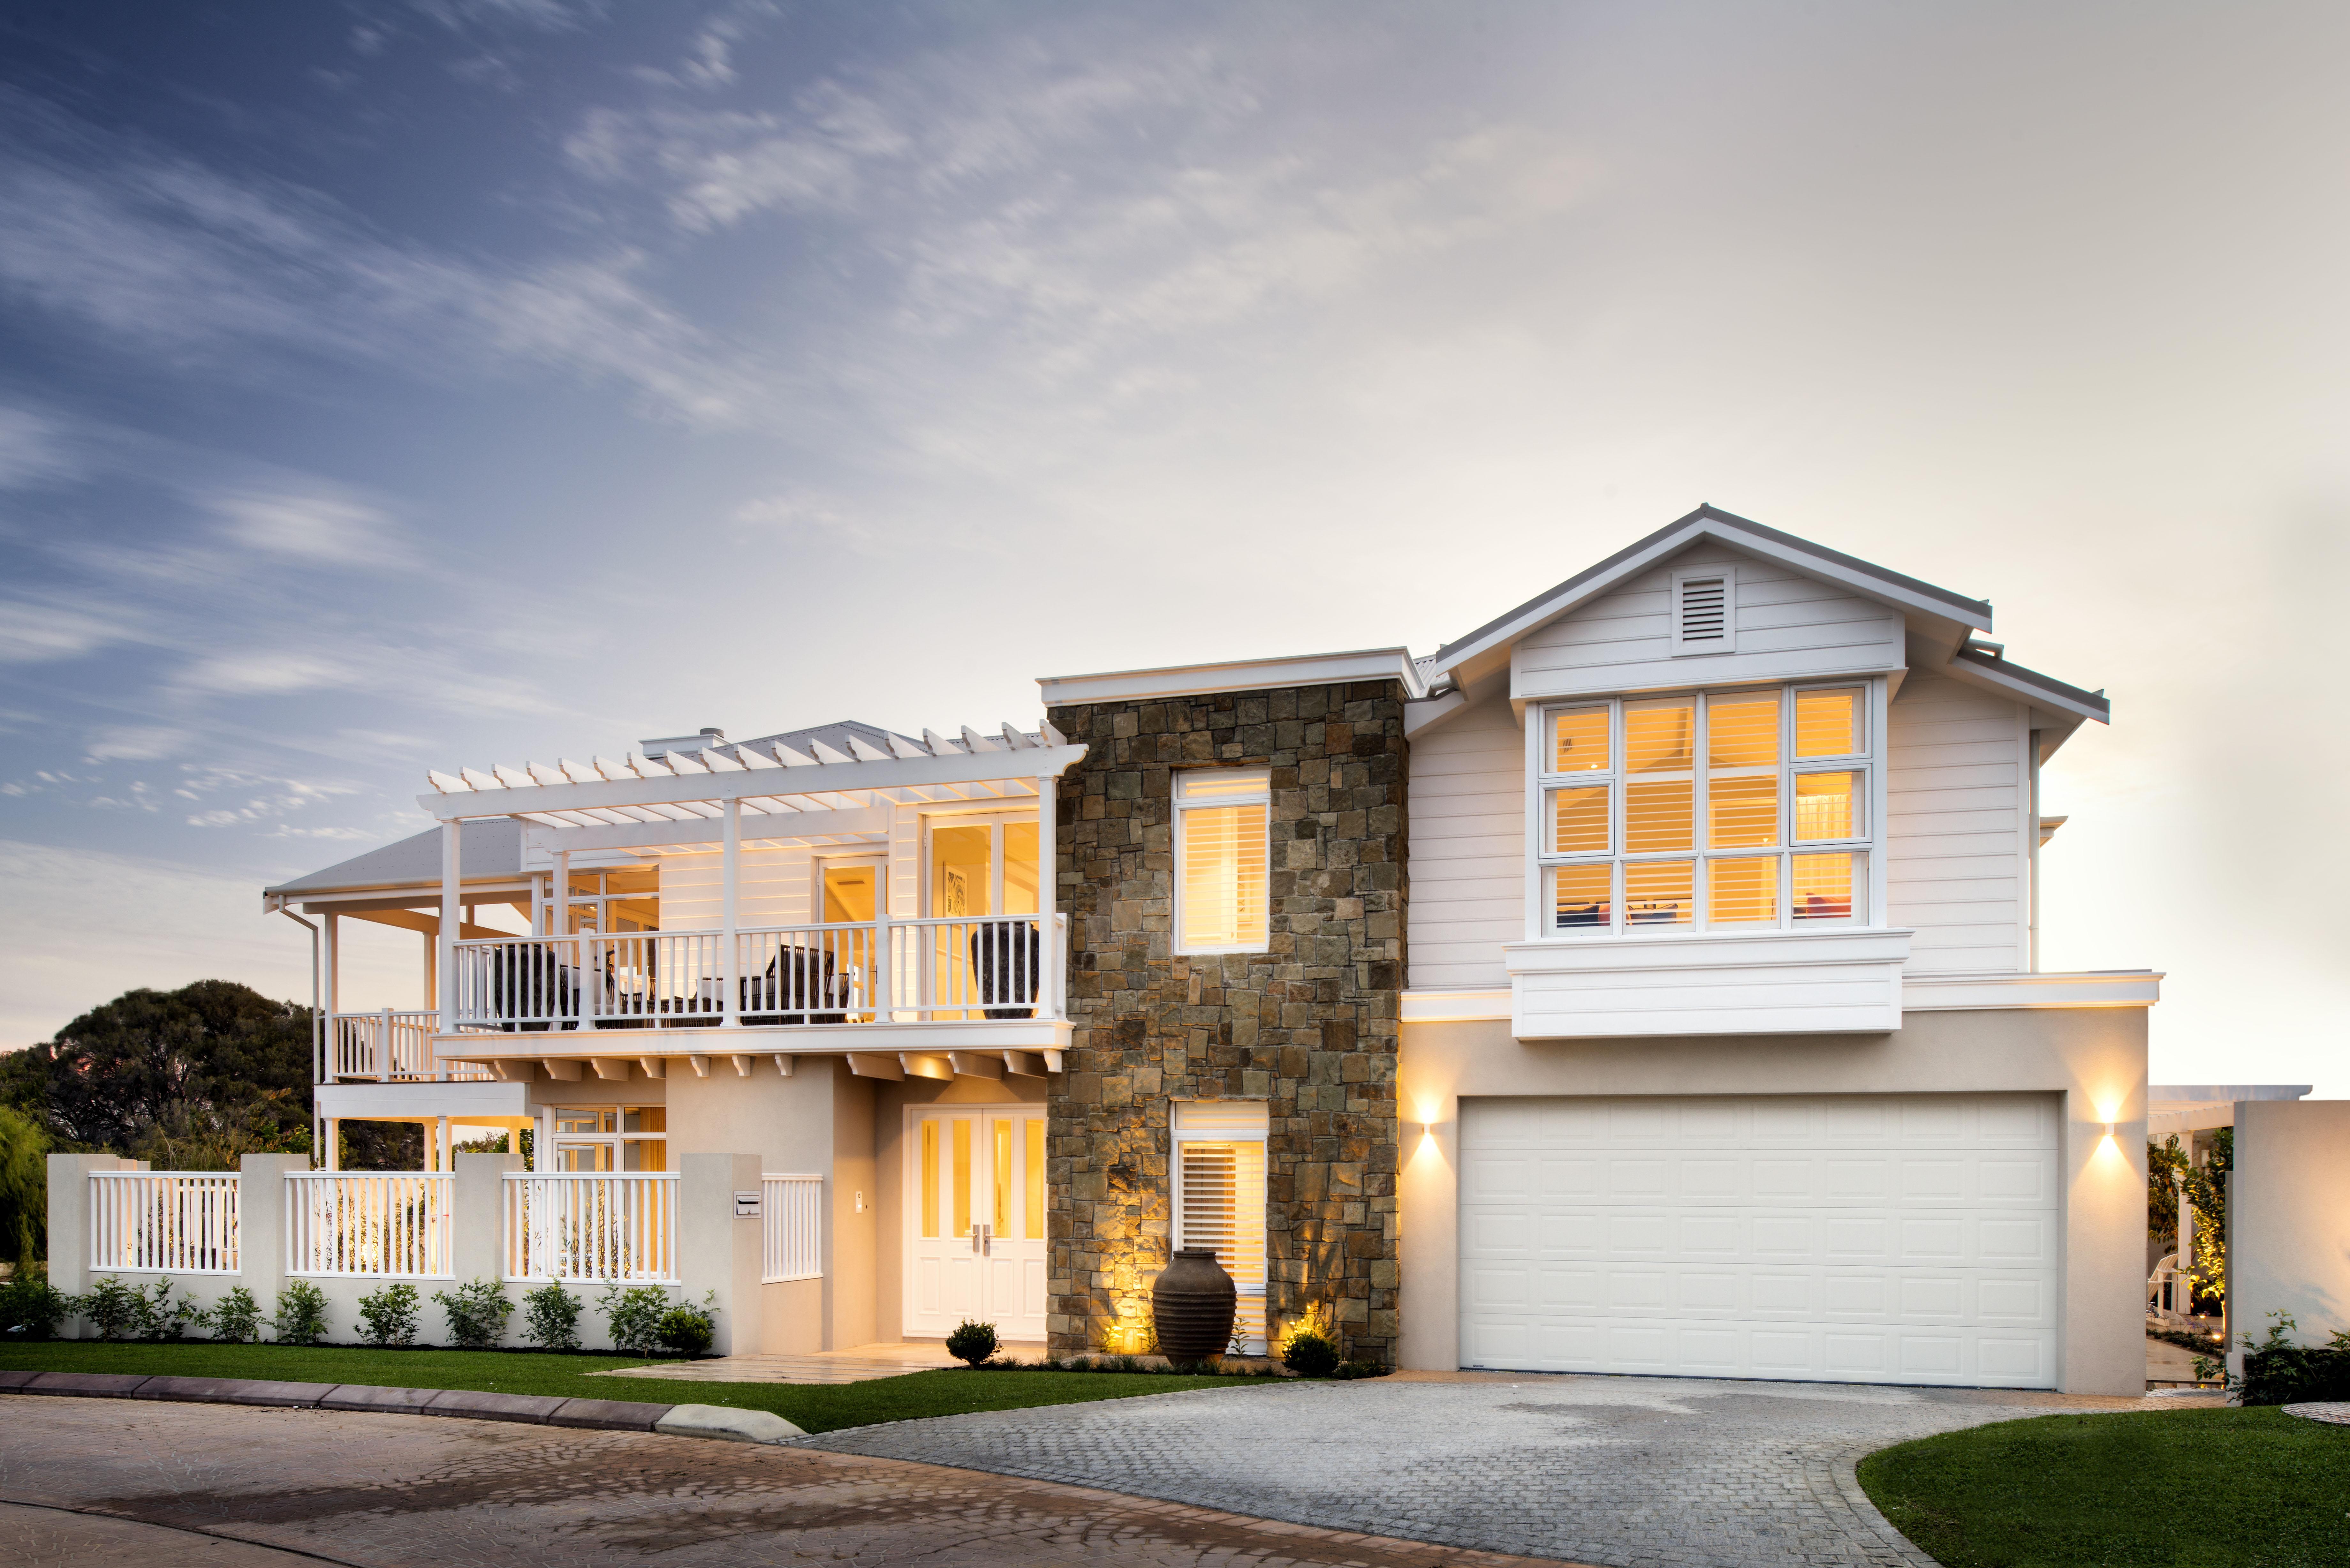 The Grayson Custom Home by Webb & Brown-Neaves exterior.